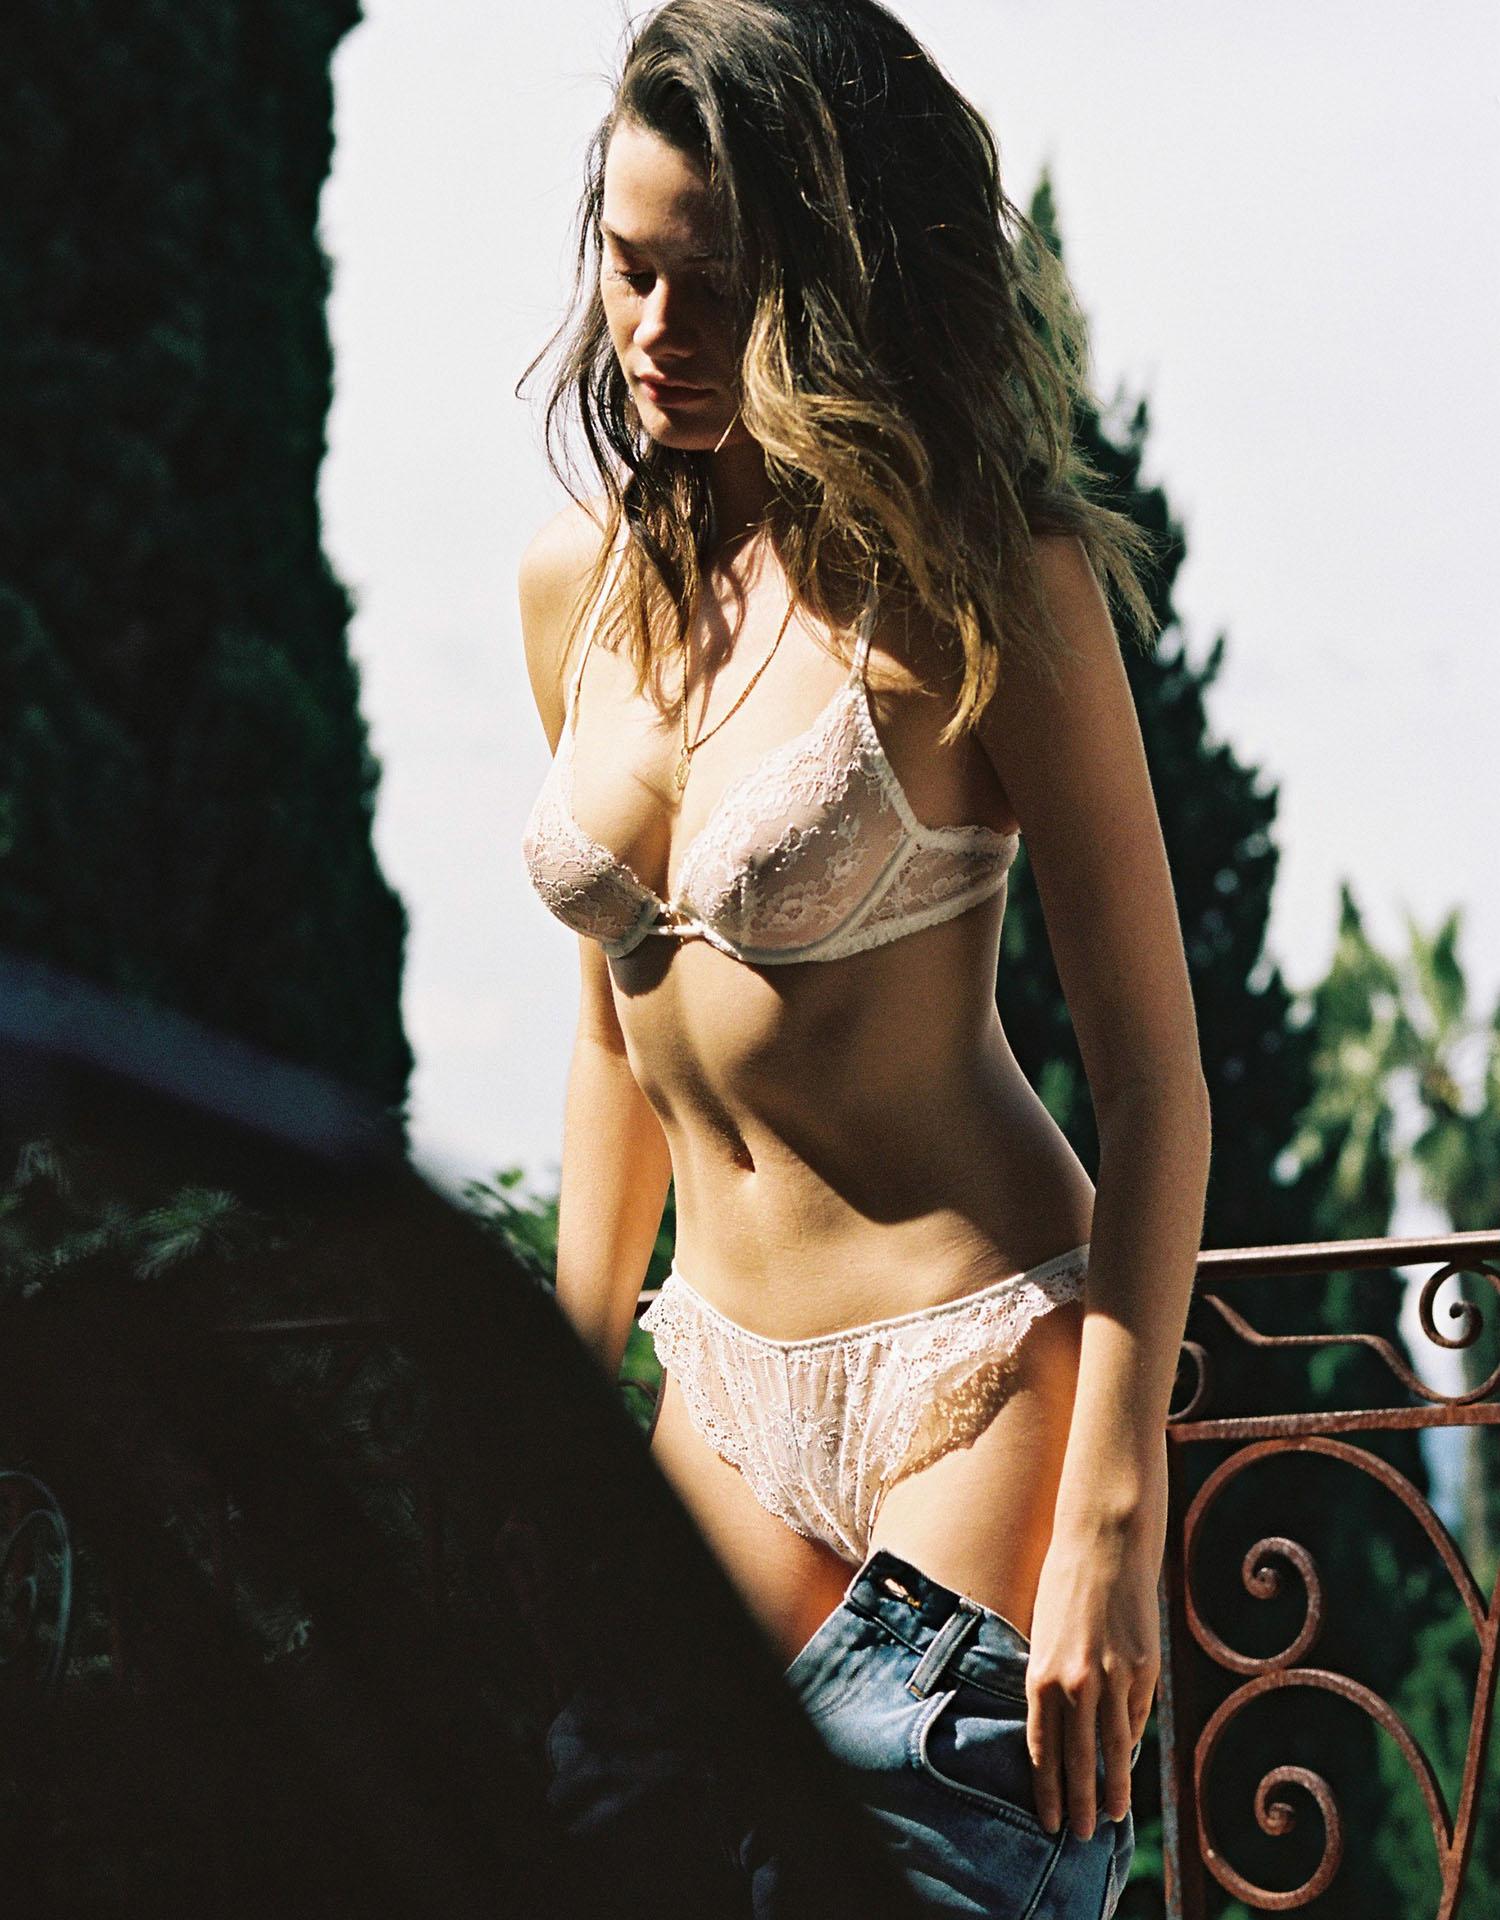 lingerie tanga Gala Ivoire 19 € Girls In Paris photo 1